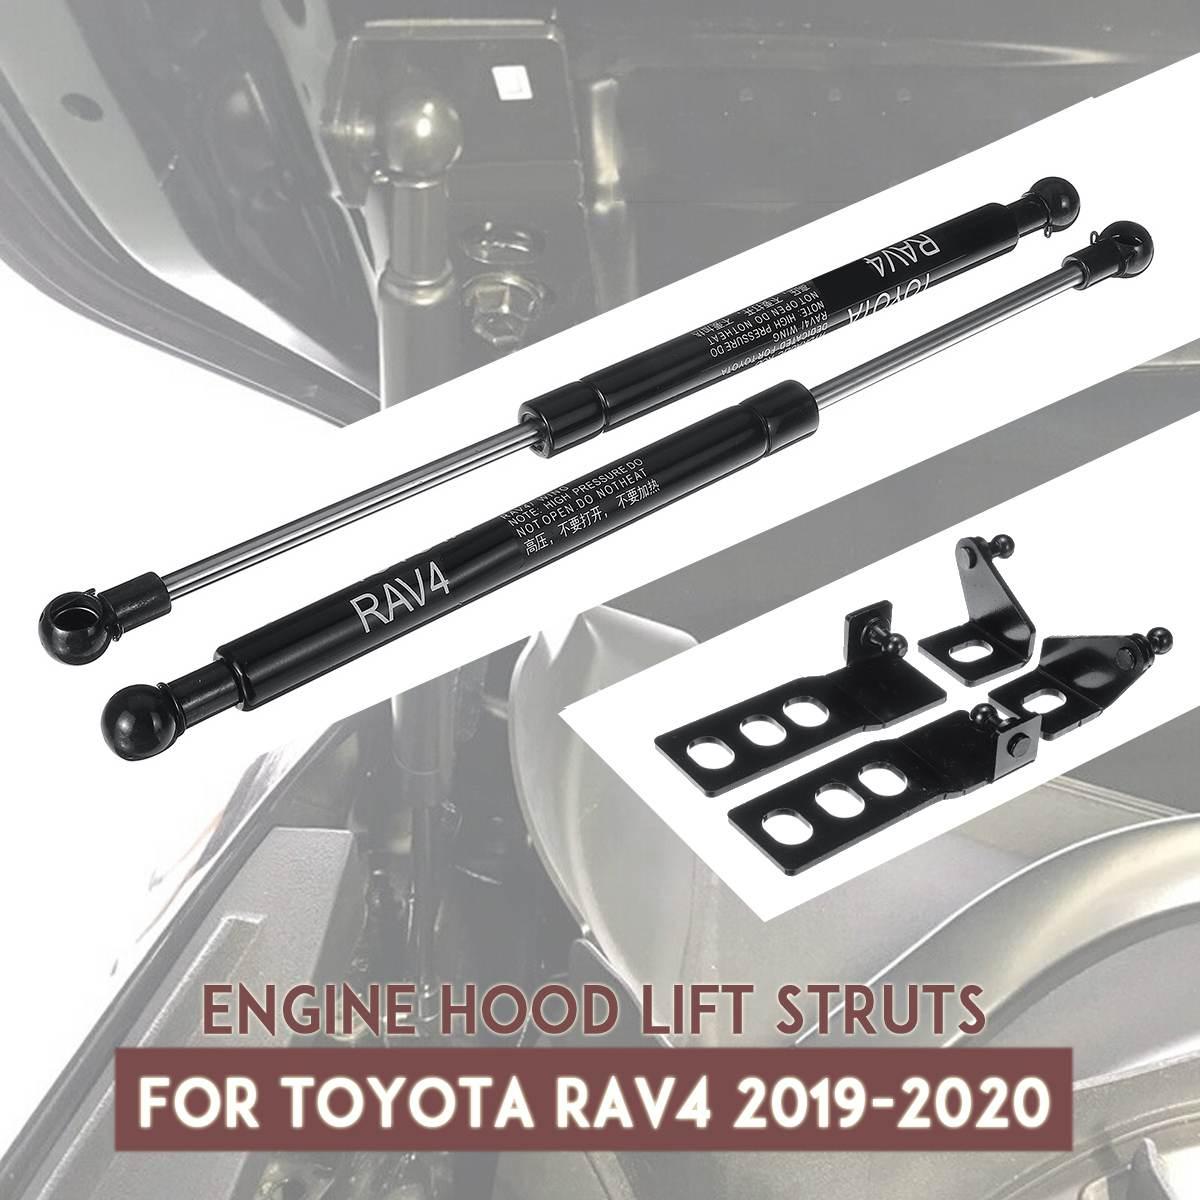 2Pcs Auto Car Front Engine Bonnet Gas Struts Bars Damper Hood Lift Support Shock For Toyota RAV4 2019 2020